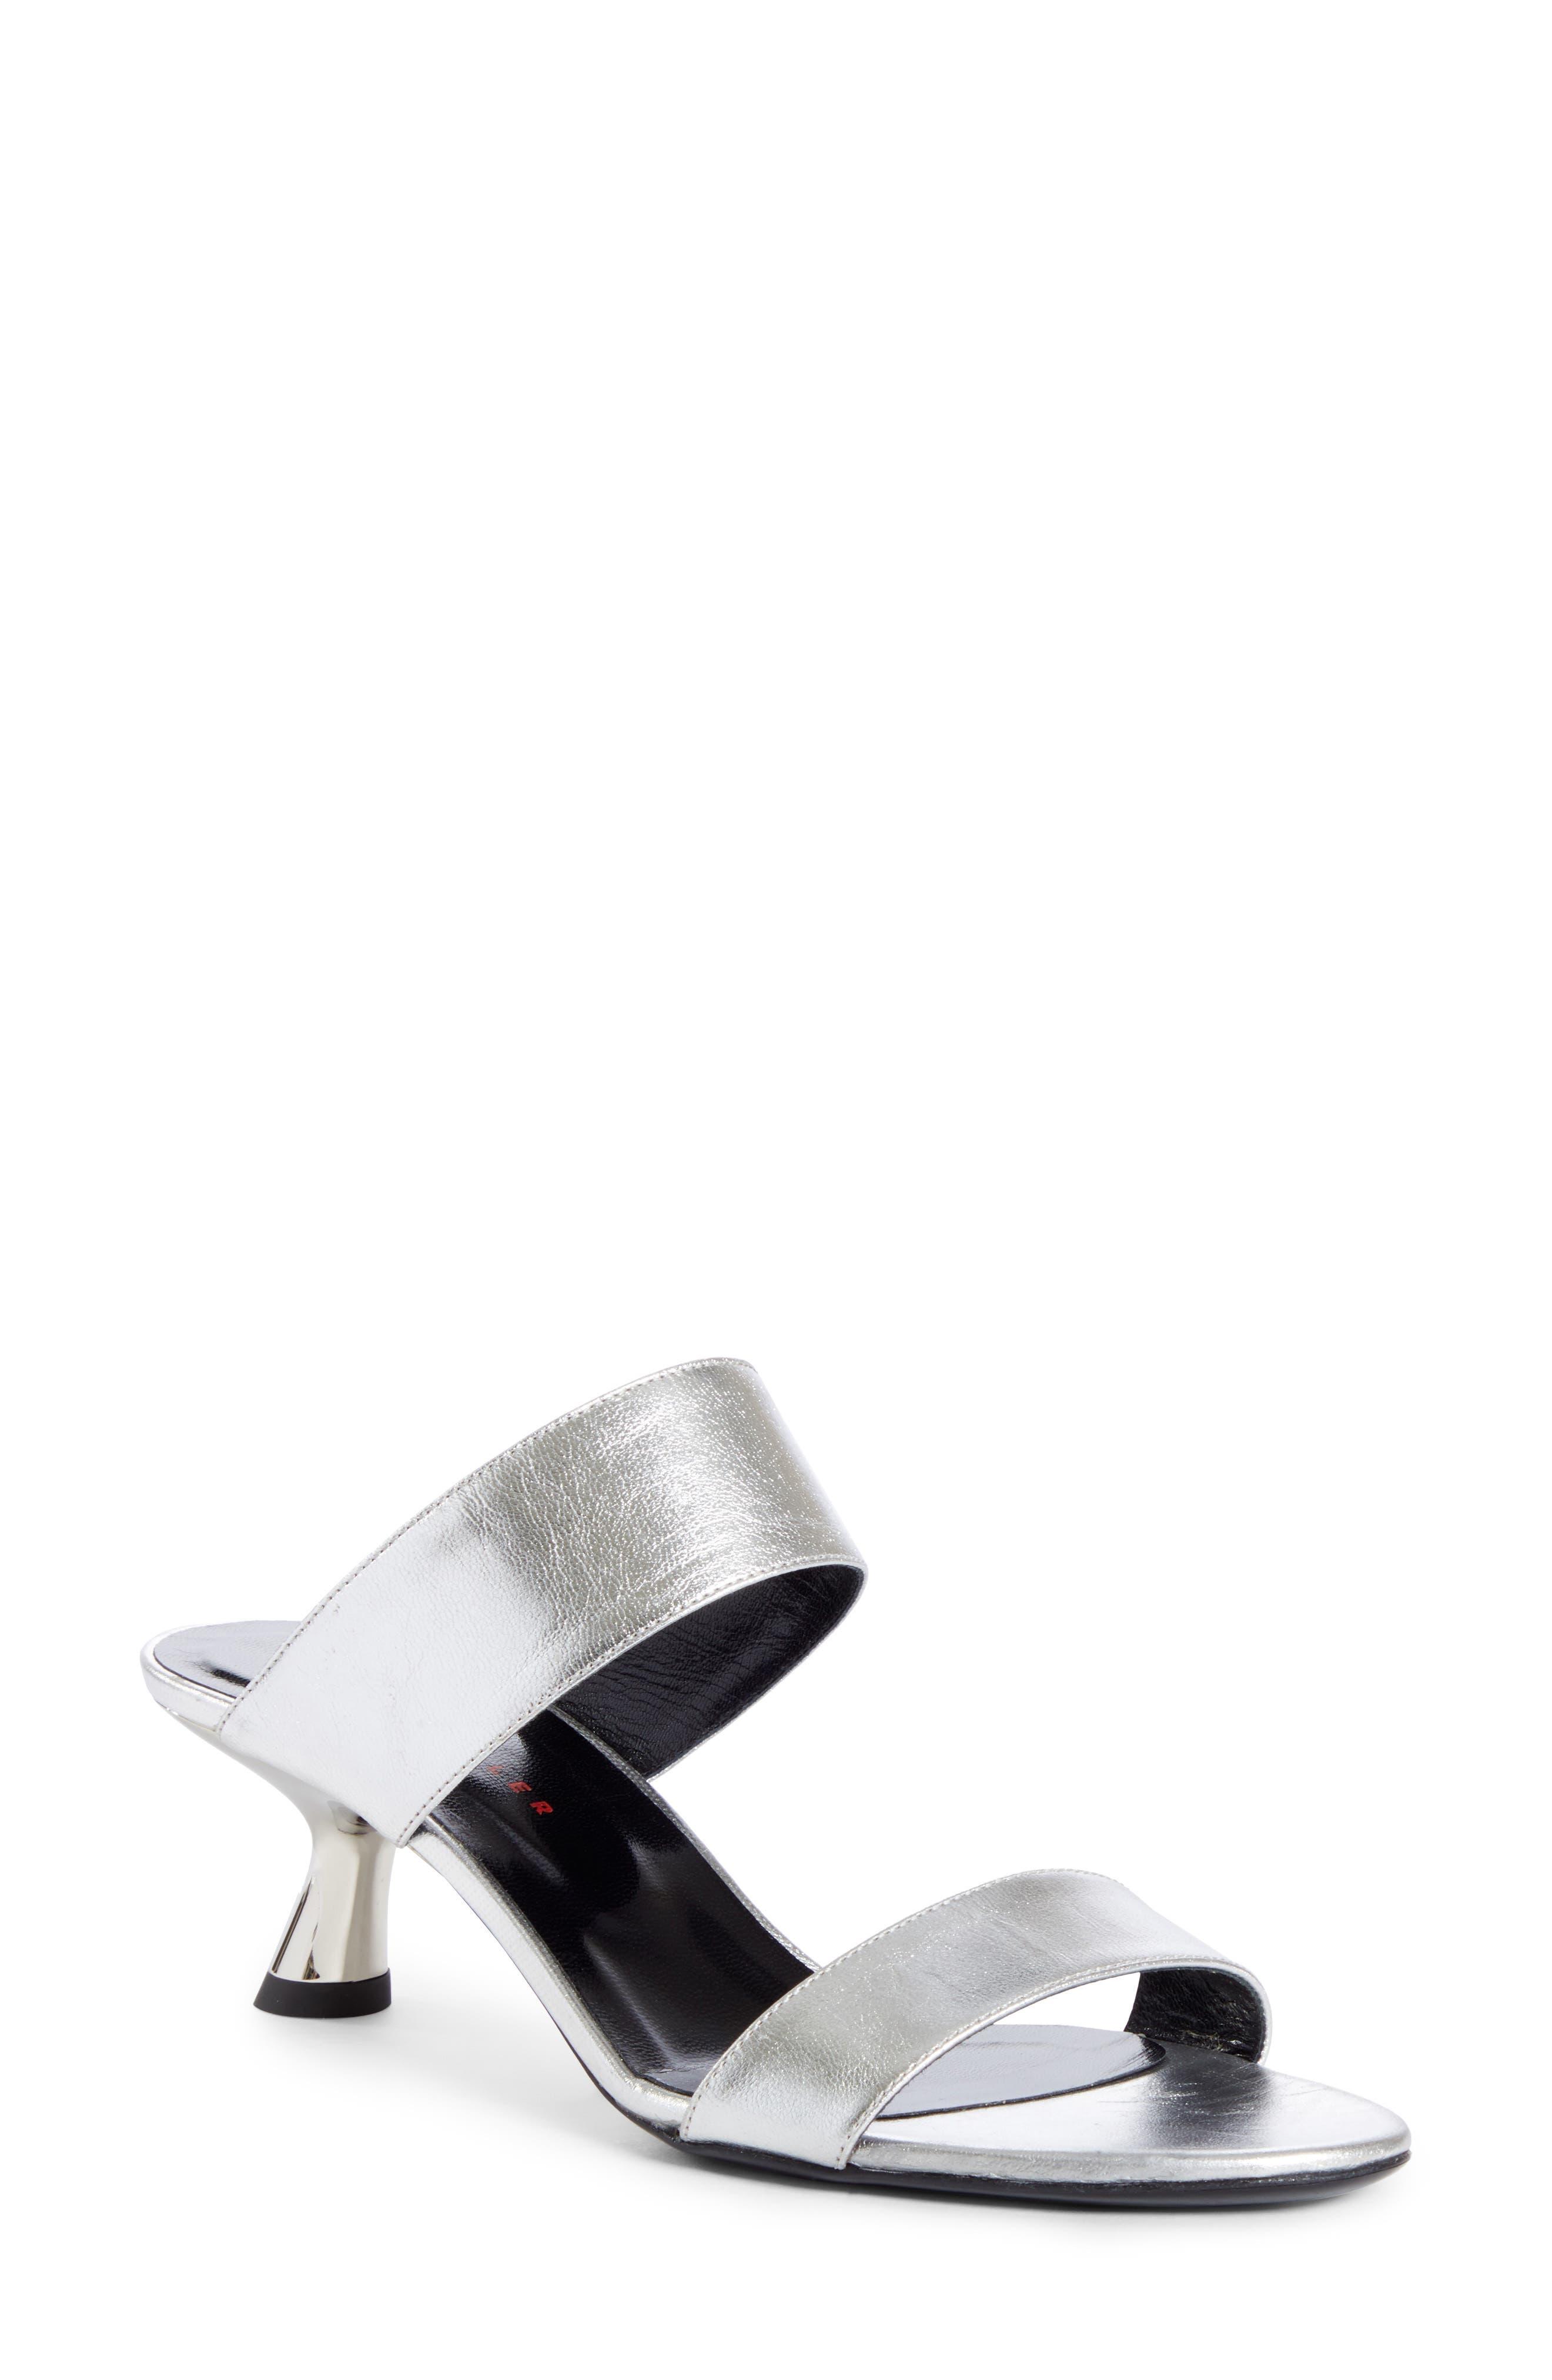 Simon Miller Shoes Tee Heel Sandal